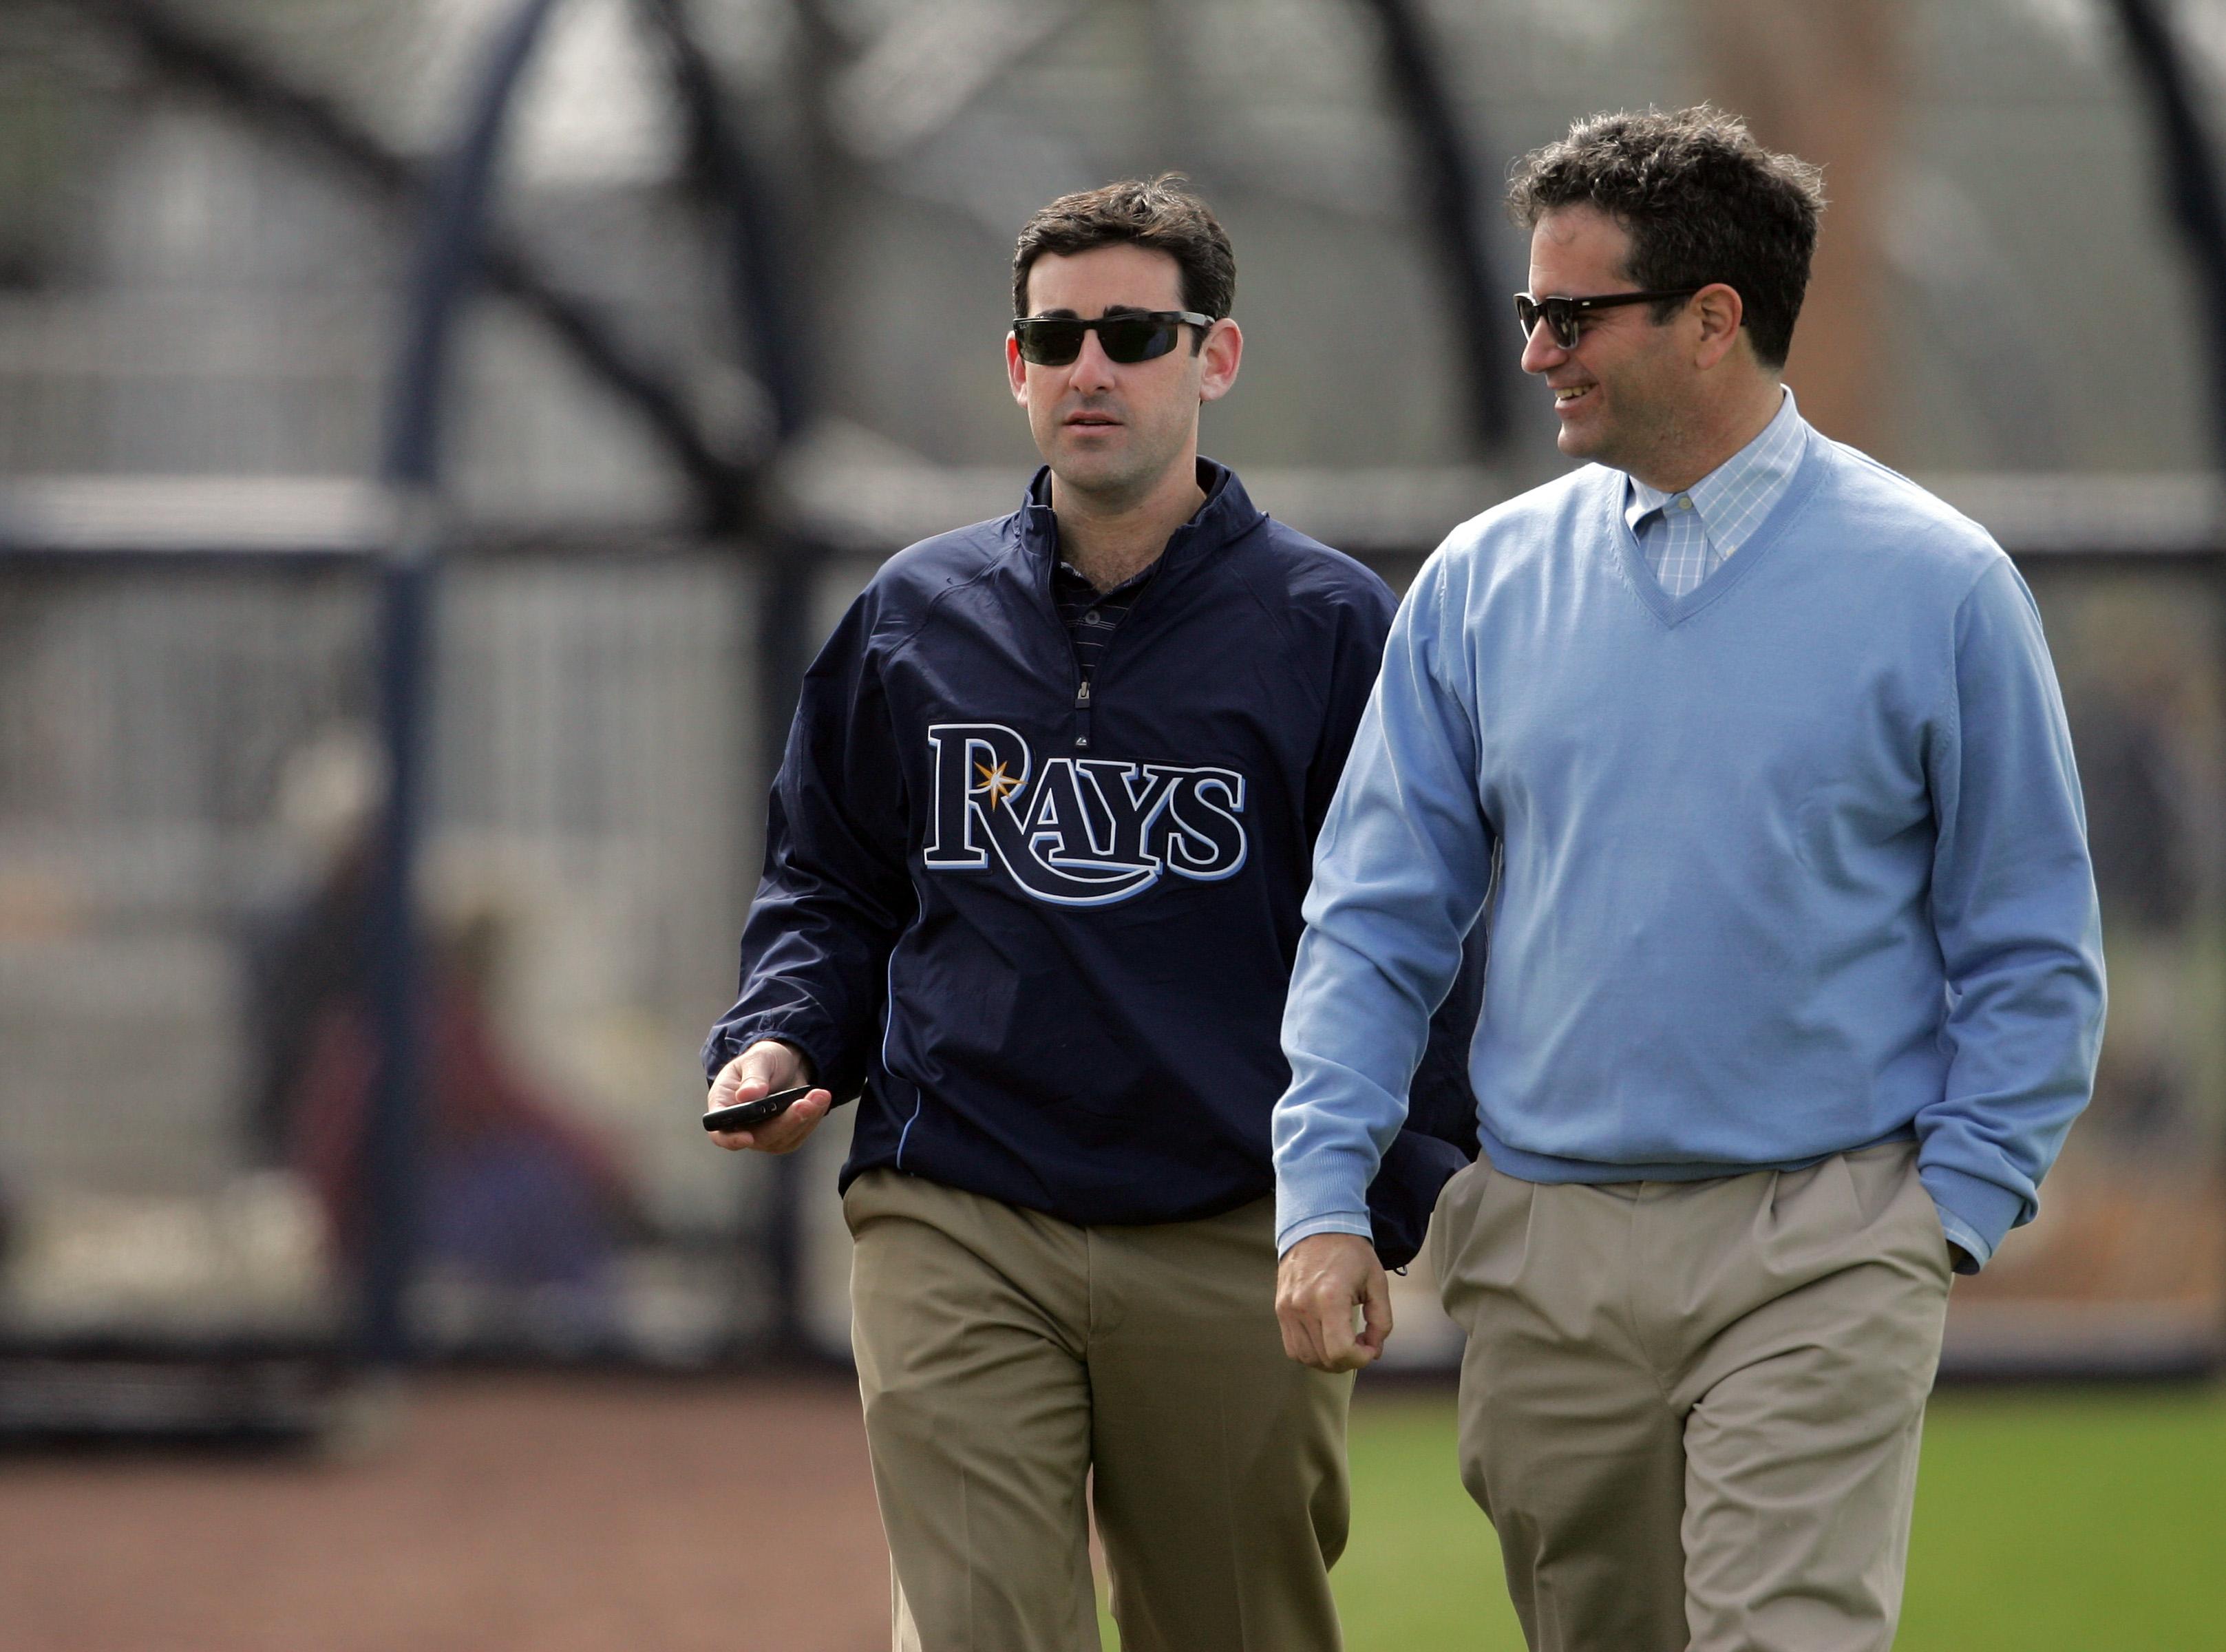 MLB: FEB 19 Rays Spring Training